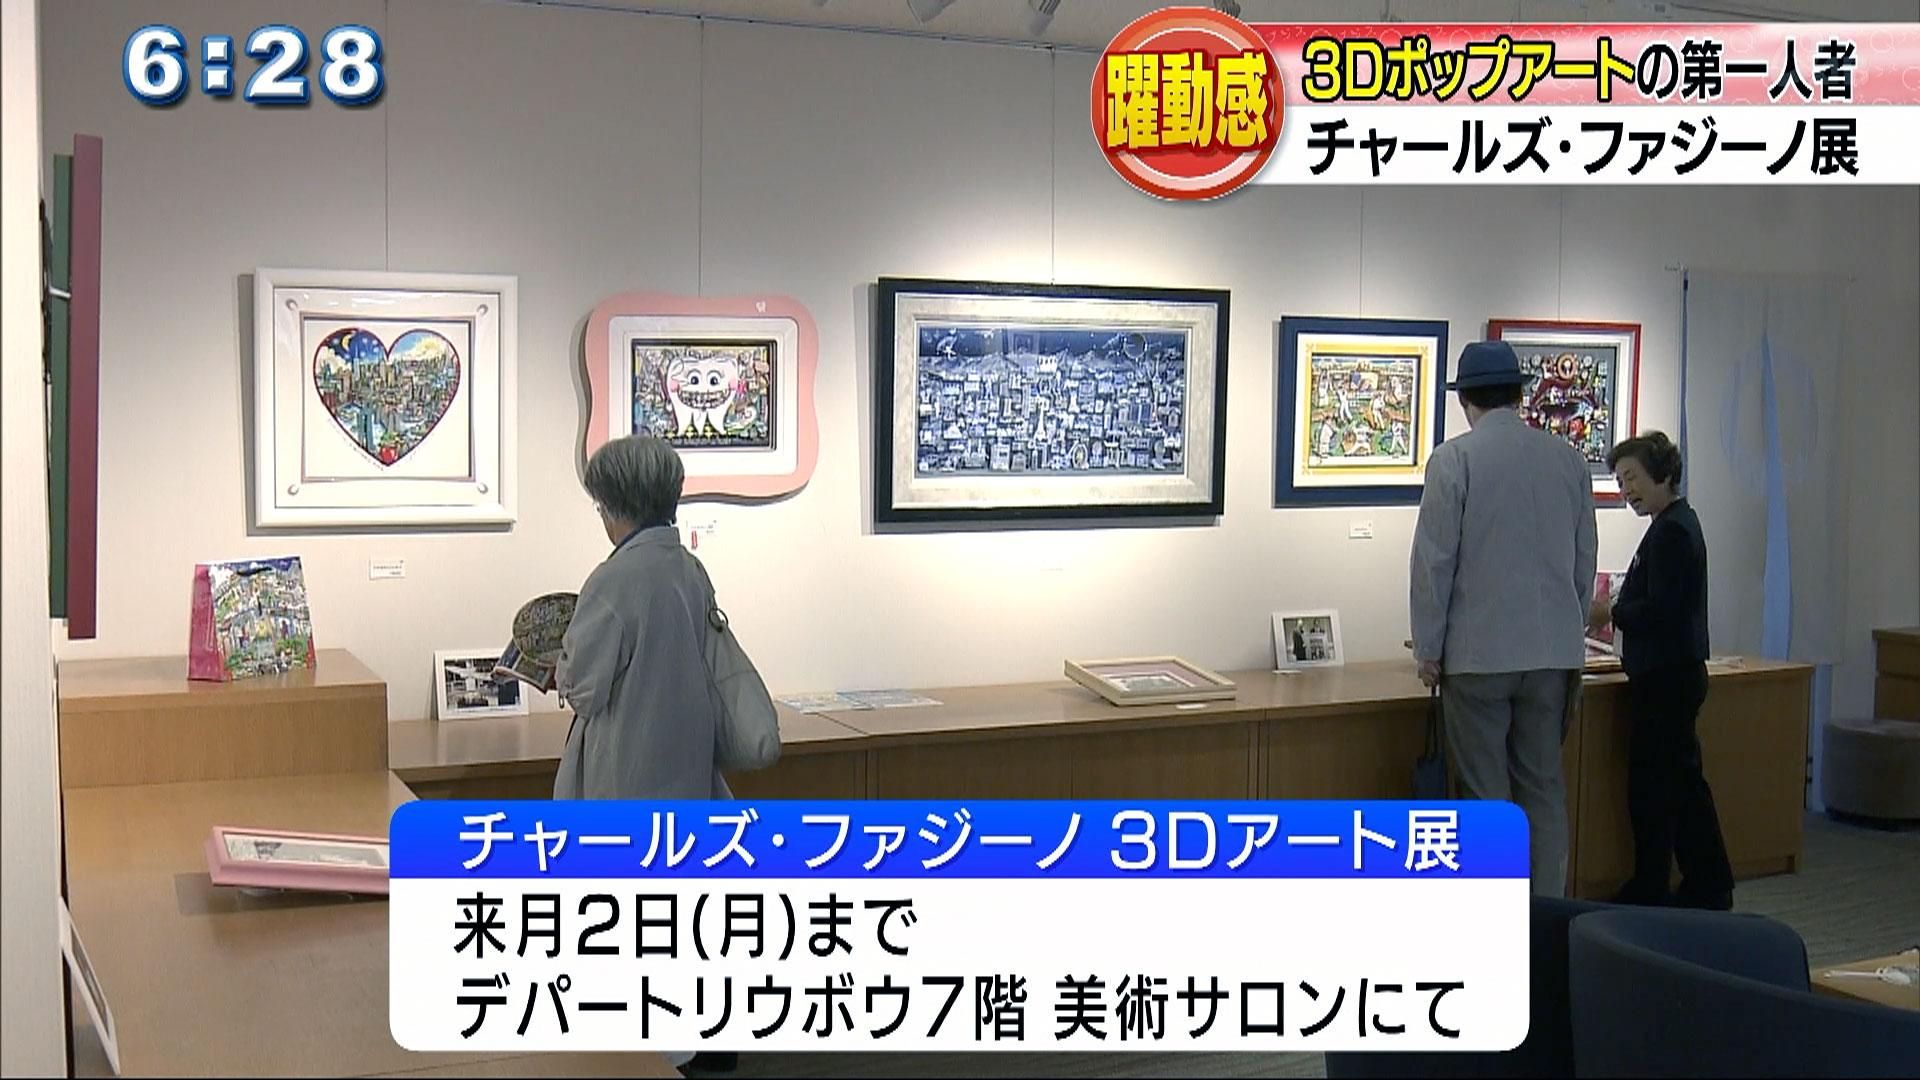 3Dポップアートの巨匠 チャールズ・ファジーノ展